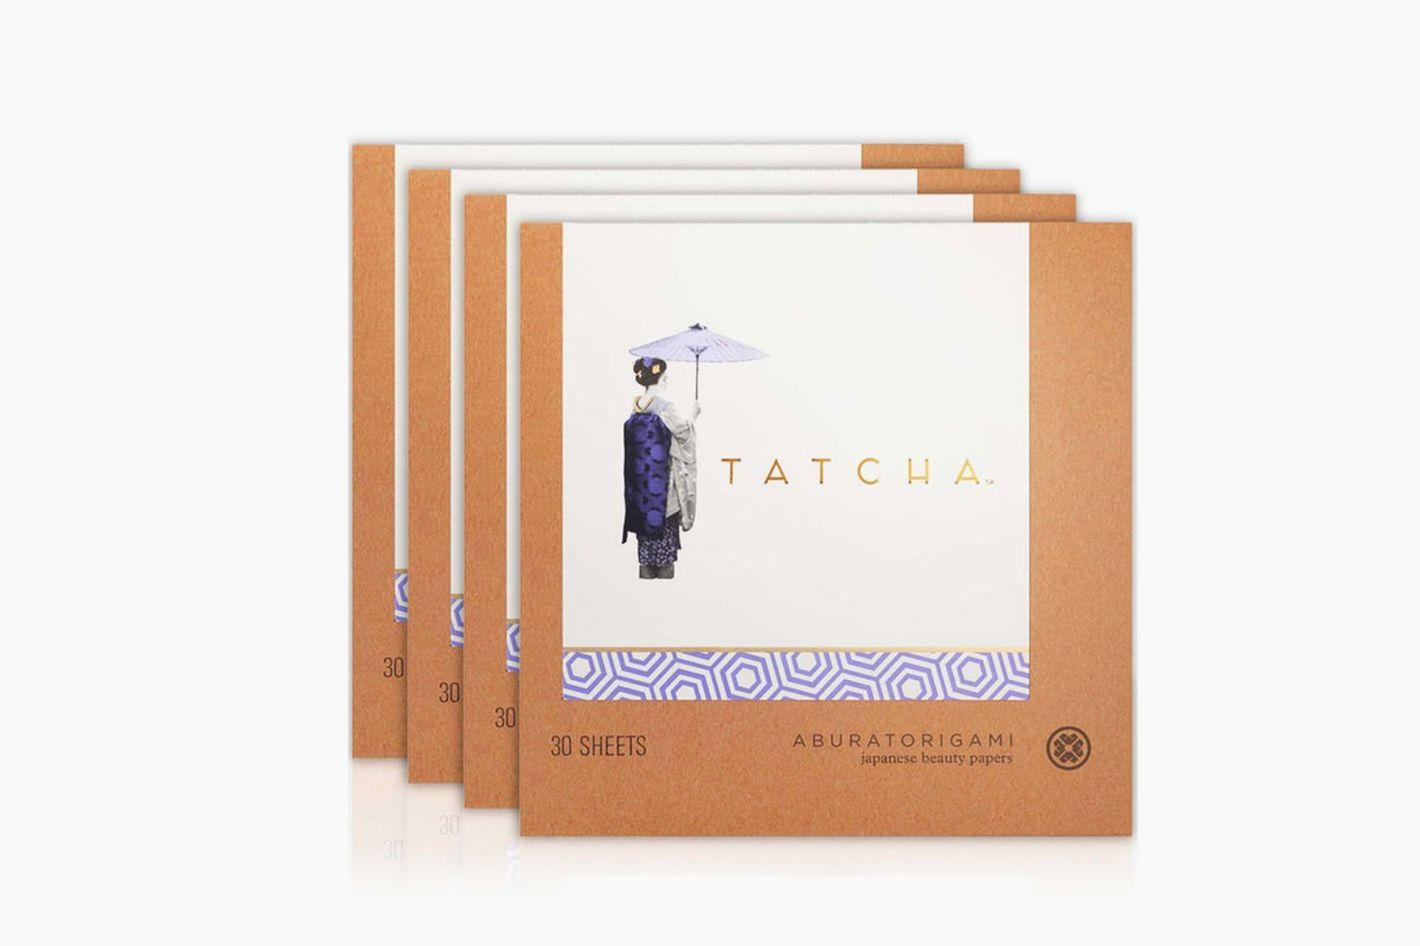 TATCHAAburatorigami Japanese Blotting Papers